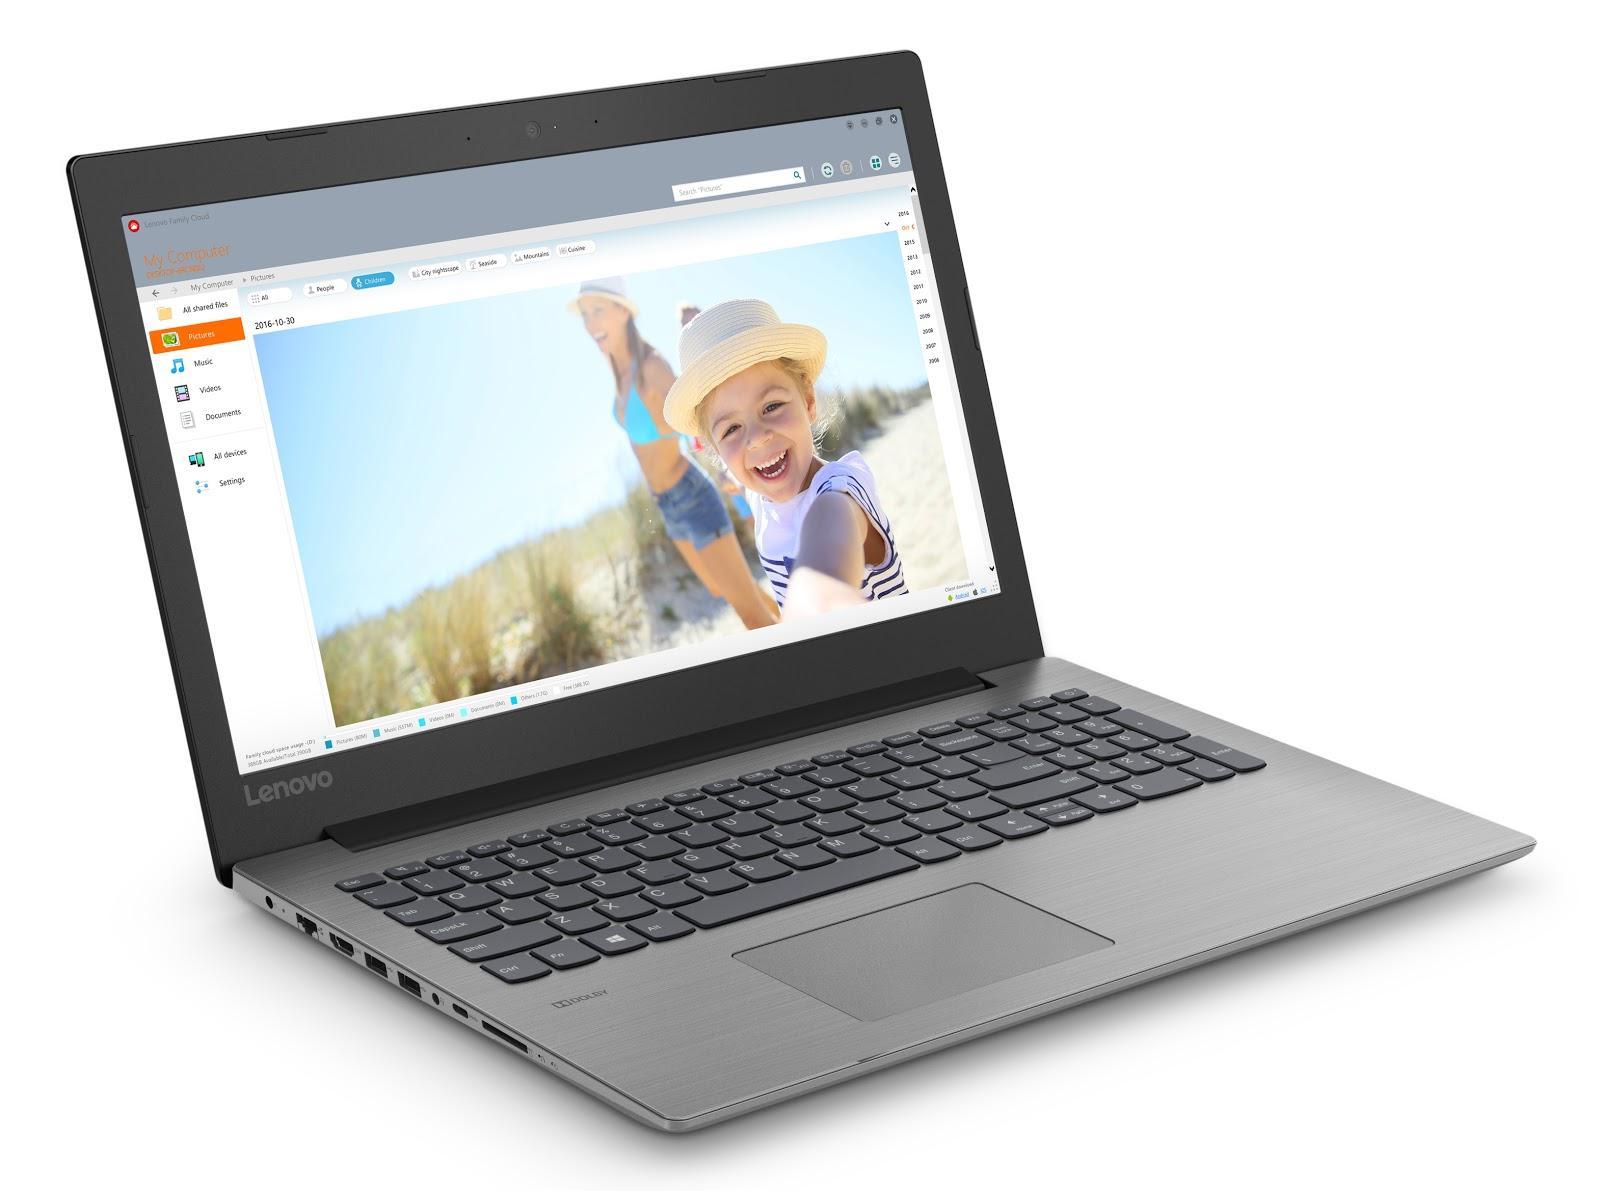 Фото 5. Ноутбук Lenovo ideapad 330-15 Onyx Black (81DE01VSRA)